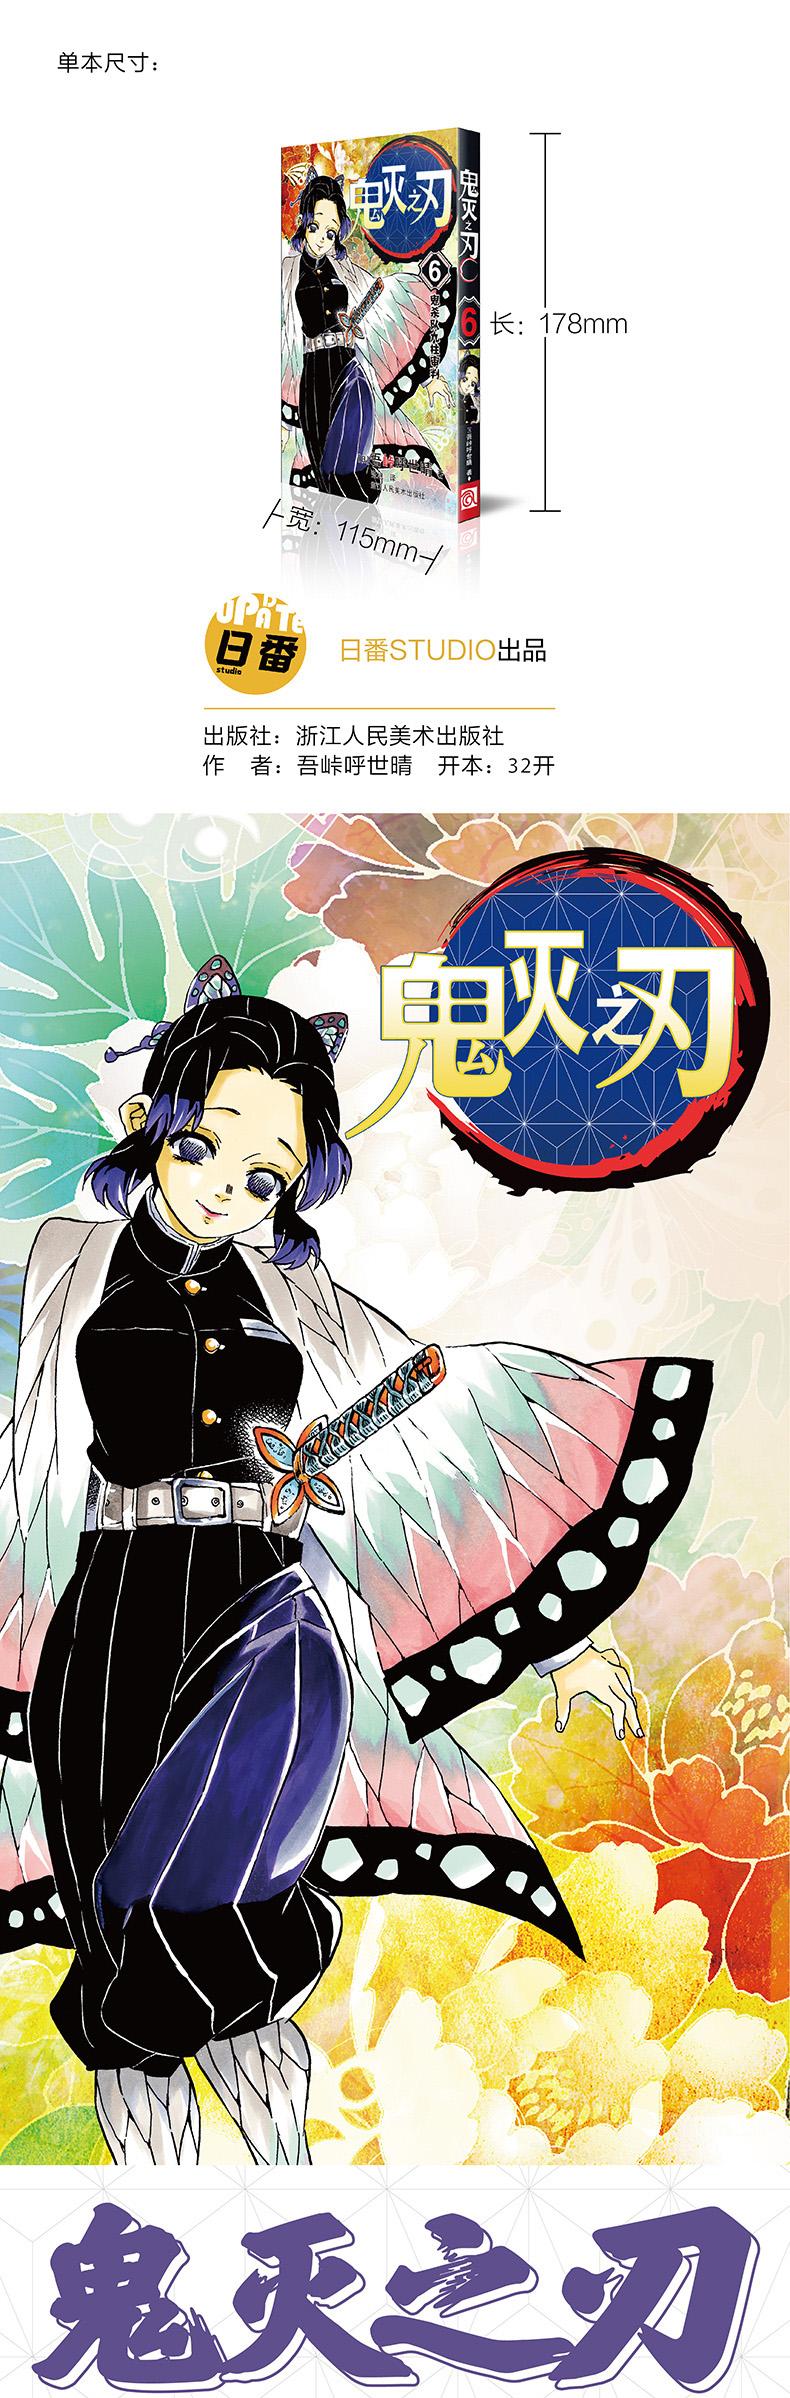 鬼滅之刃1-9巻(全9巻セット)